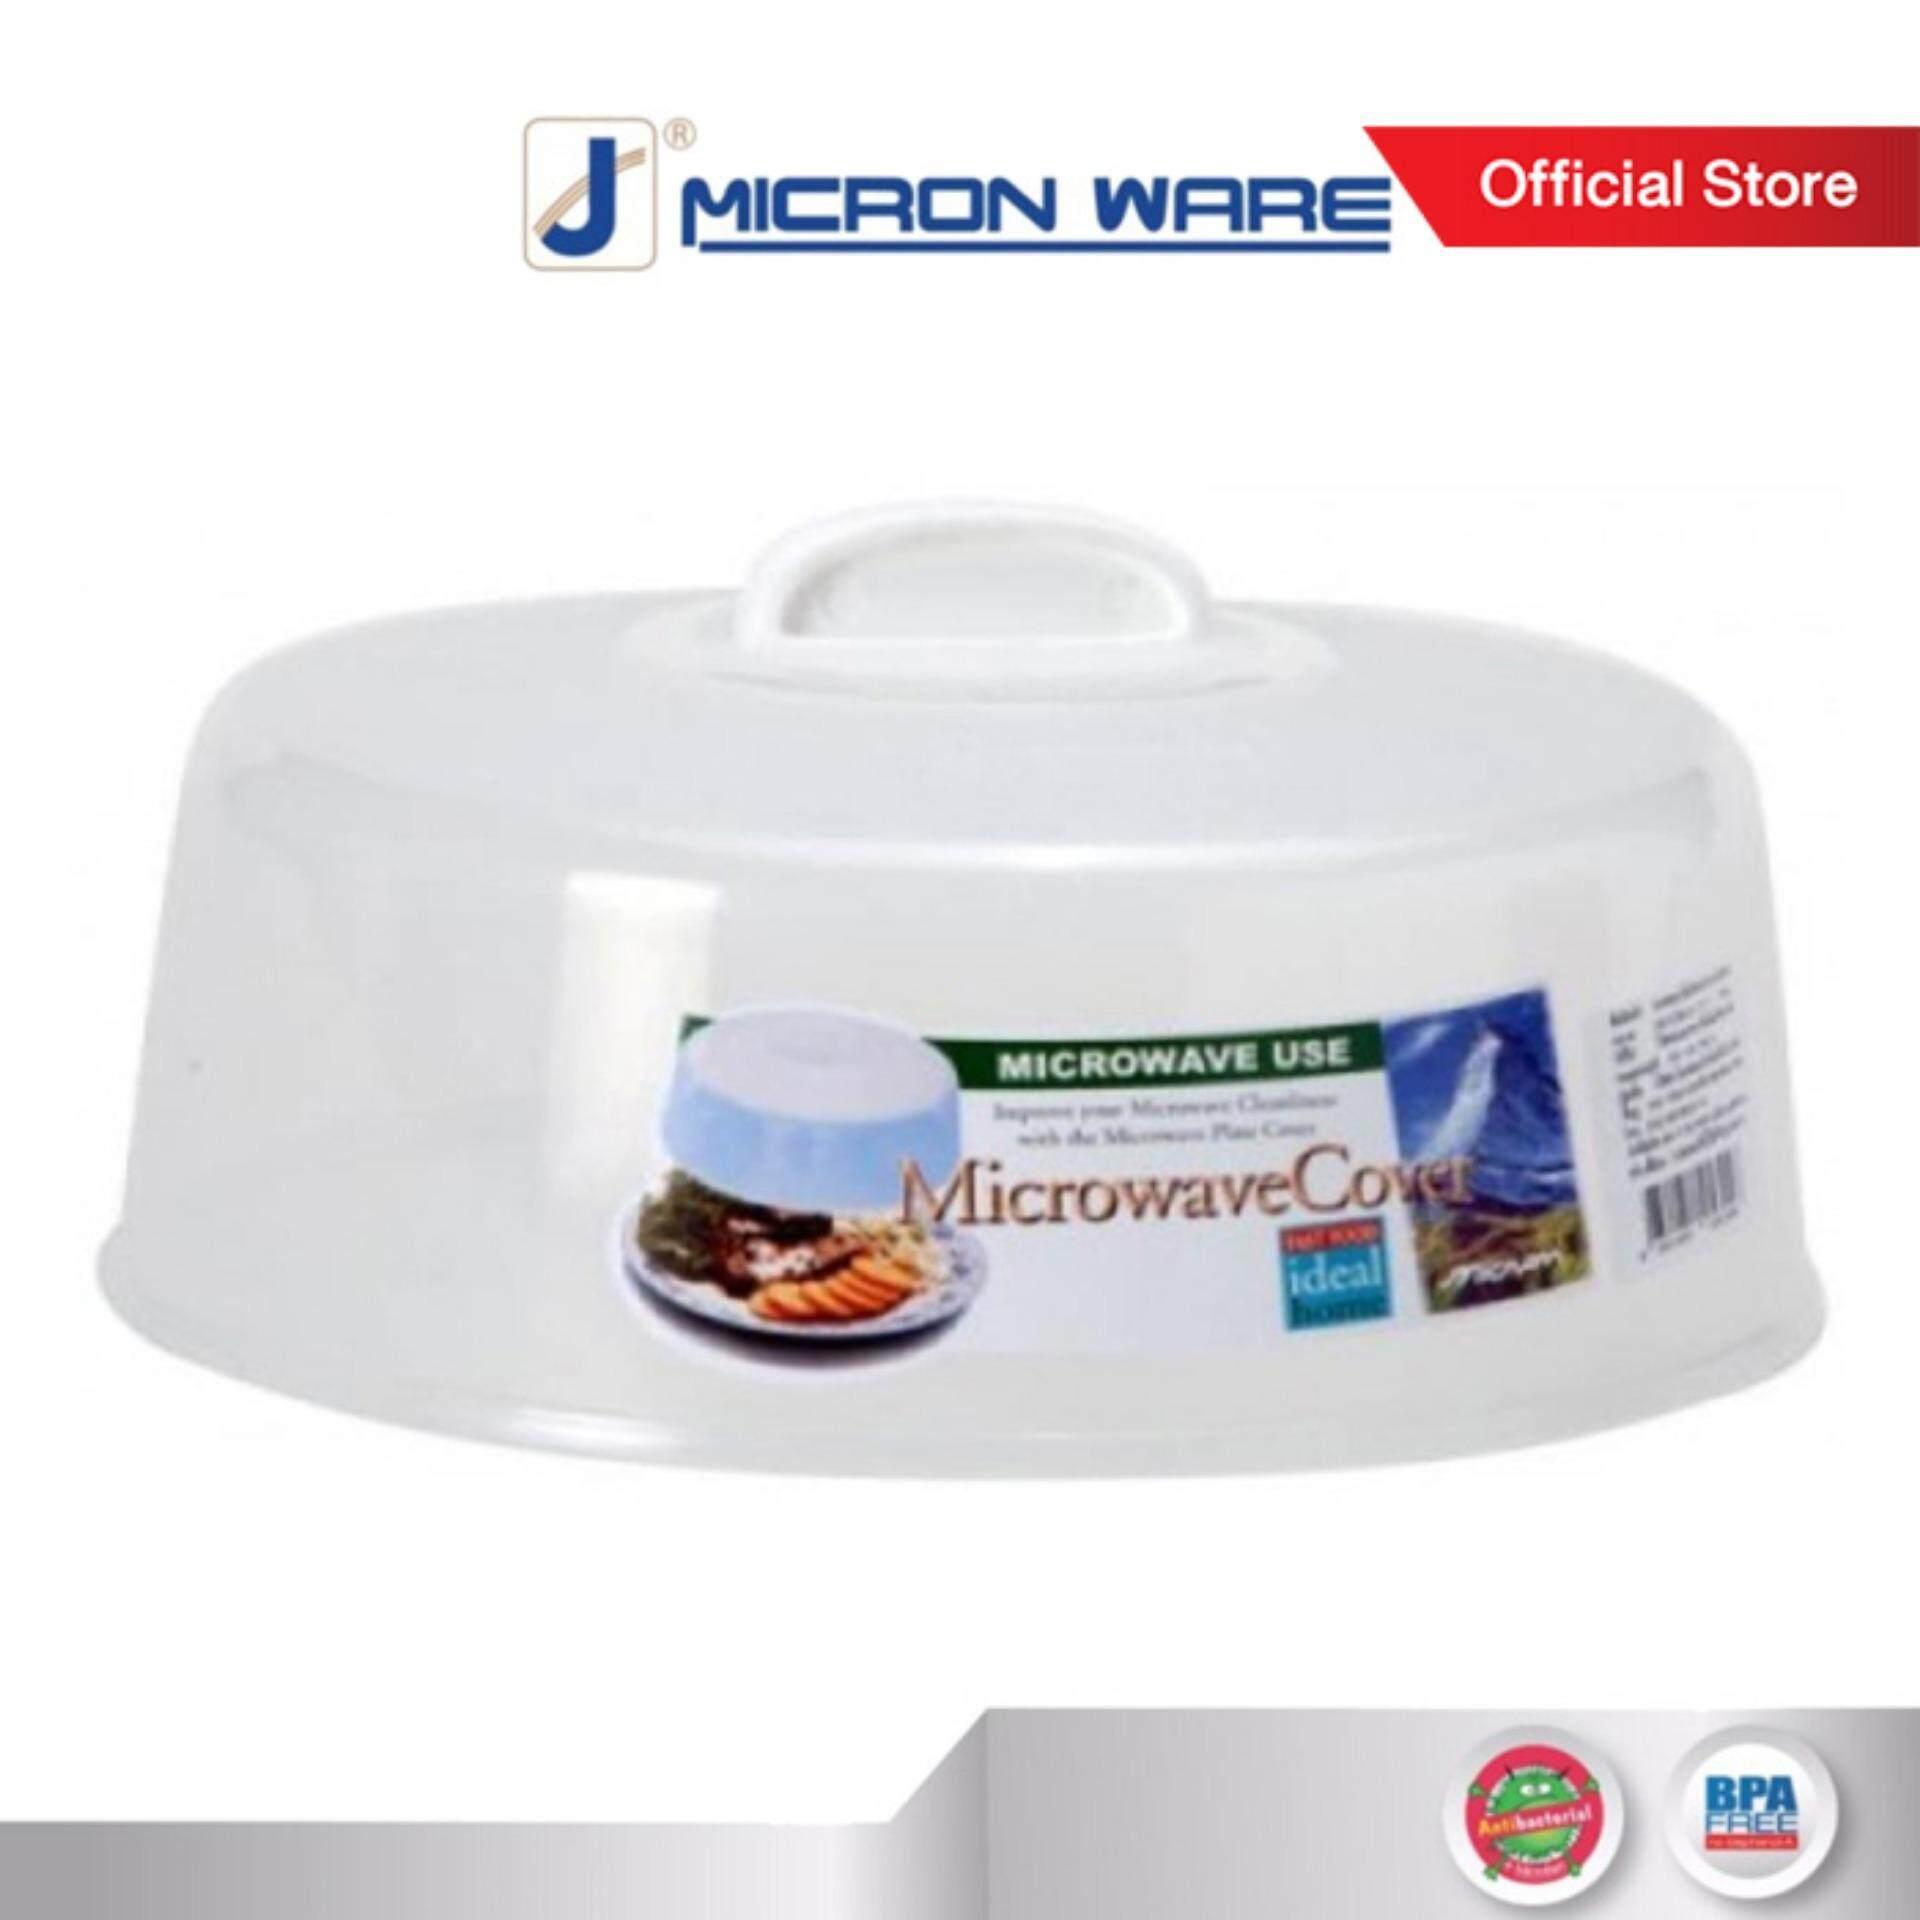 Micronware ฝาครอบอุ่นอาหาร ฝาครอบไมโครเวฟ ฝาครอบอาหาร ภาชนะอุ่นอาหาร Microwave Cover 5304 เส้นผ่าศูนย์กลาง 23.3 Cm ขนาดกลาง ปลอดสารก่อมะเร็ง Bpa-Free เข้าไมโครเวฟได้ Super Lock Superlock ซุปเปอร์ล็อค.